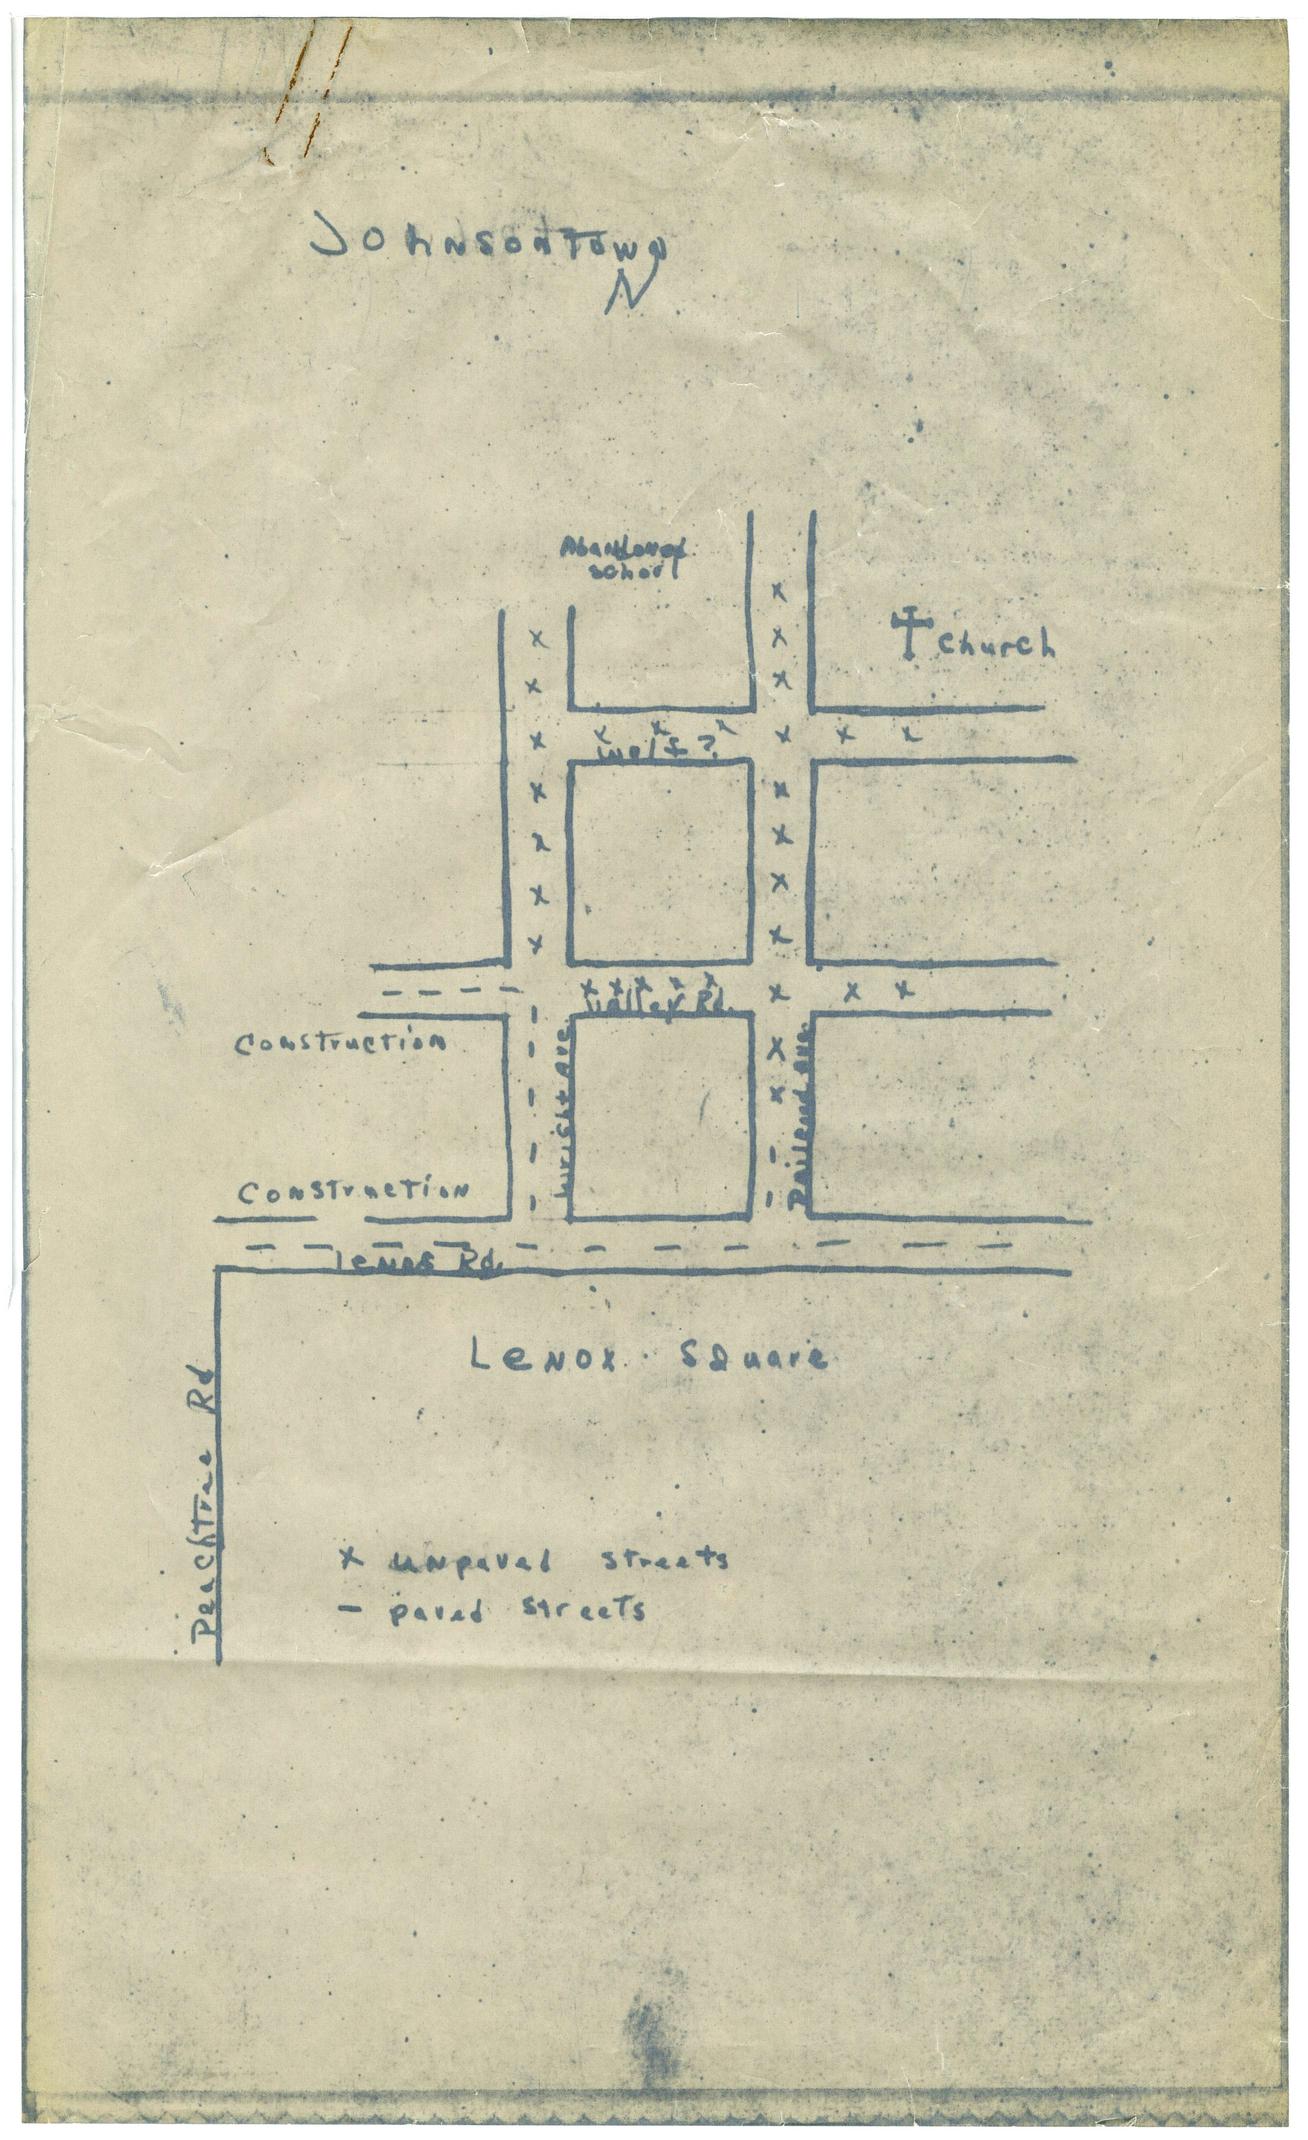 Map of Johnsontown